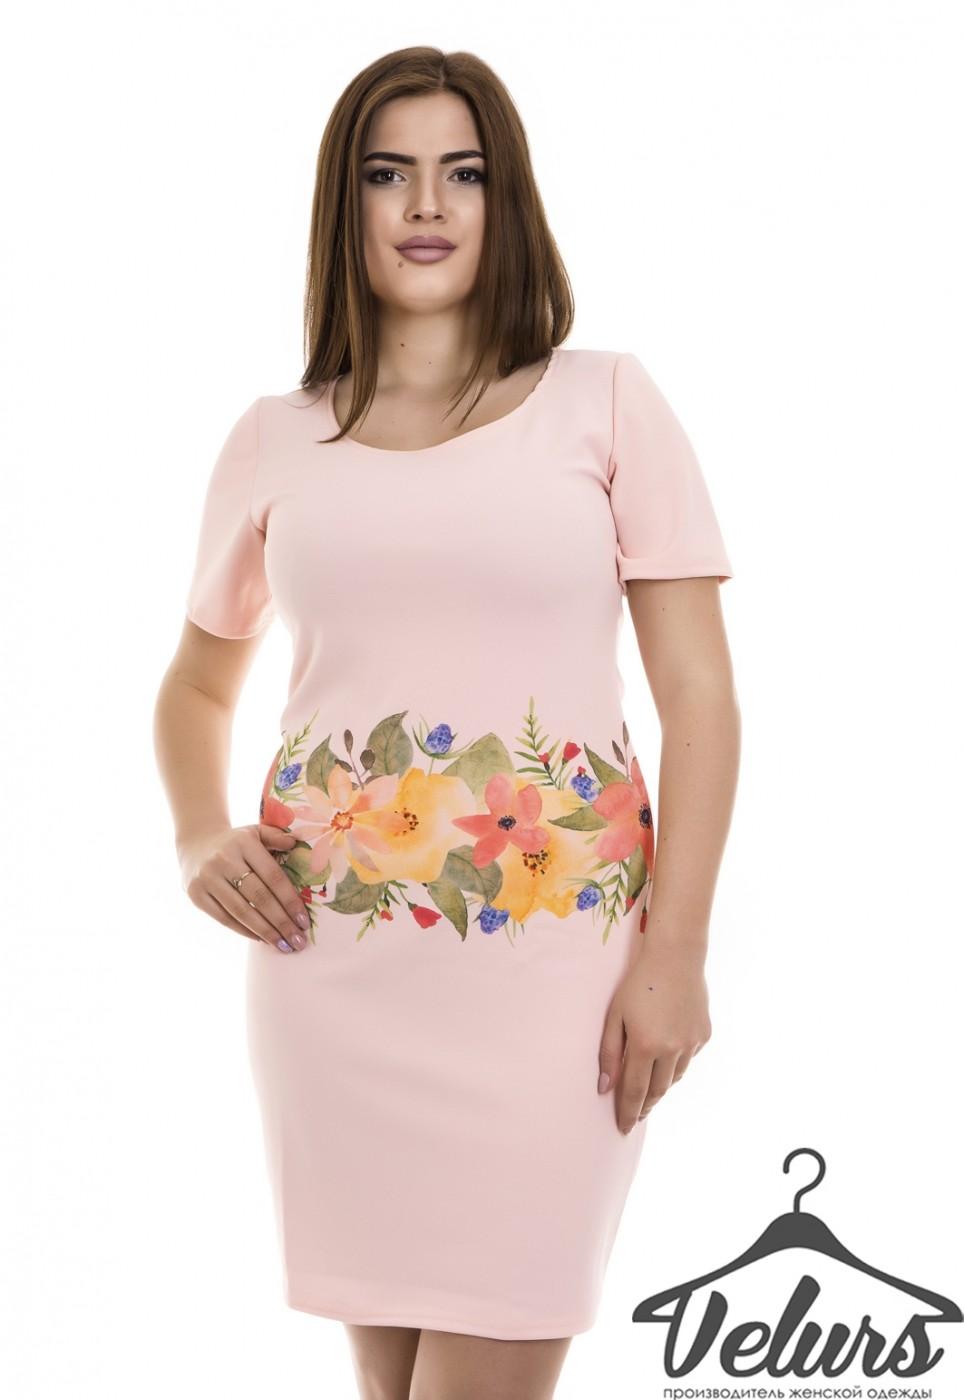 Velurs: Платье 212126 - фото 11